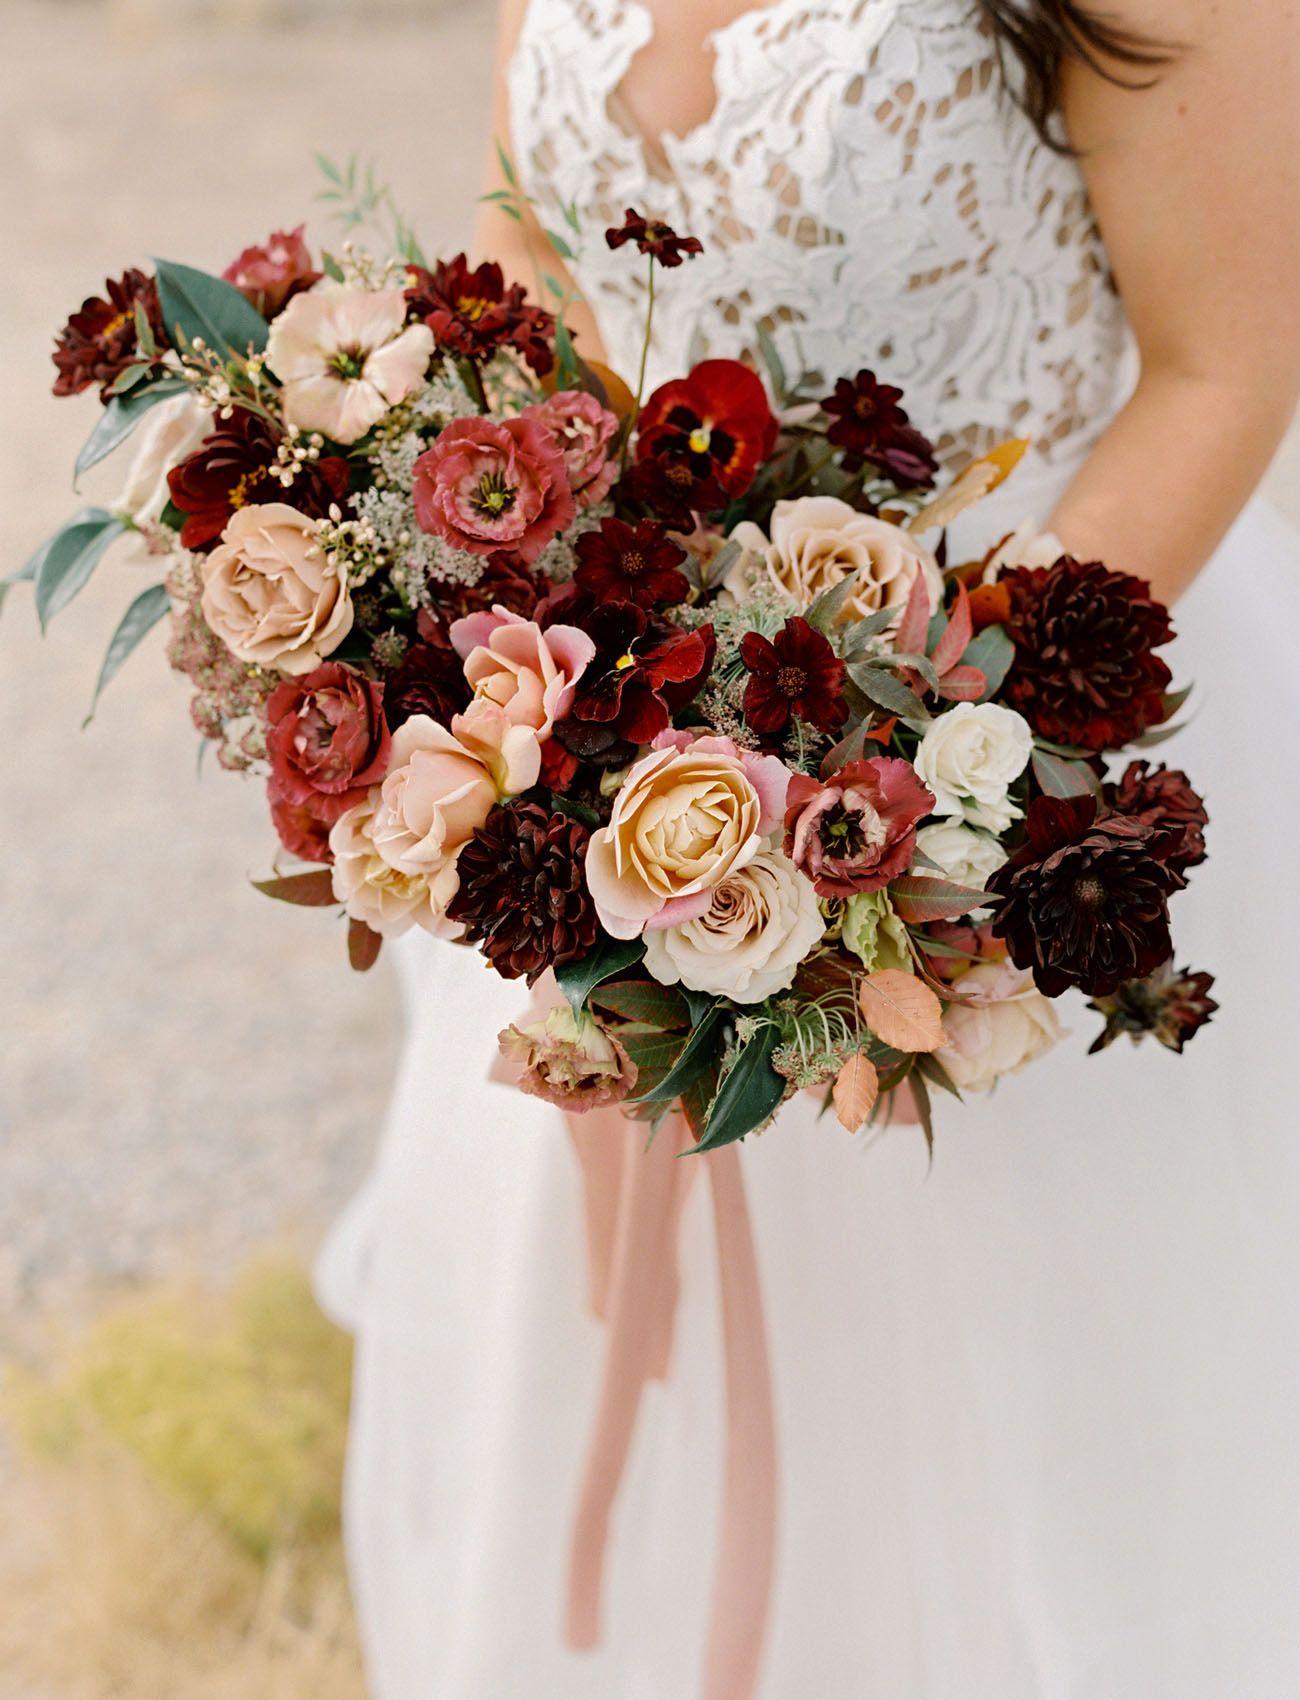 [8+] Big Wedding Flowers Bouquet